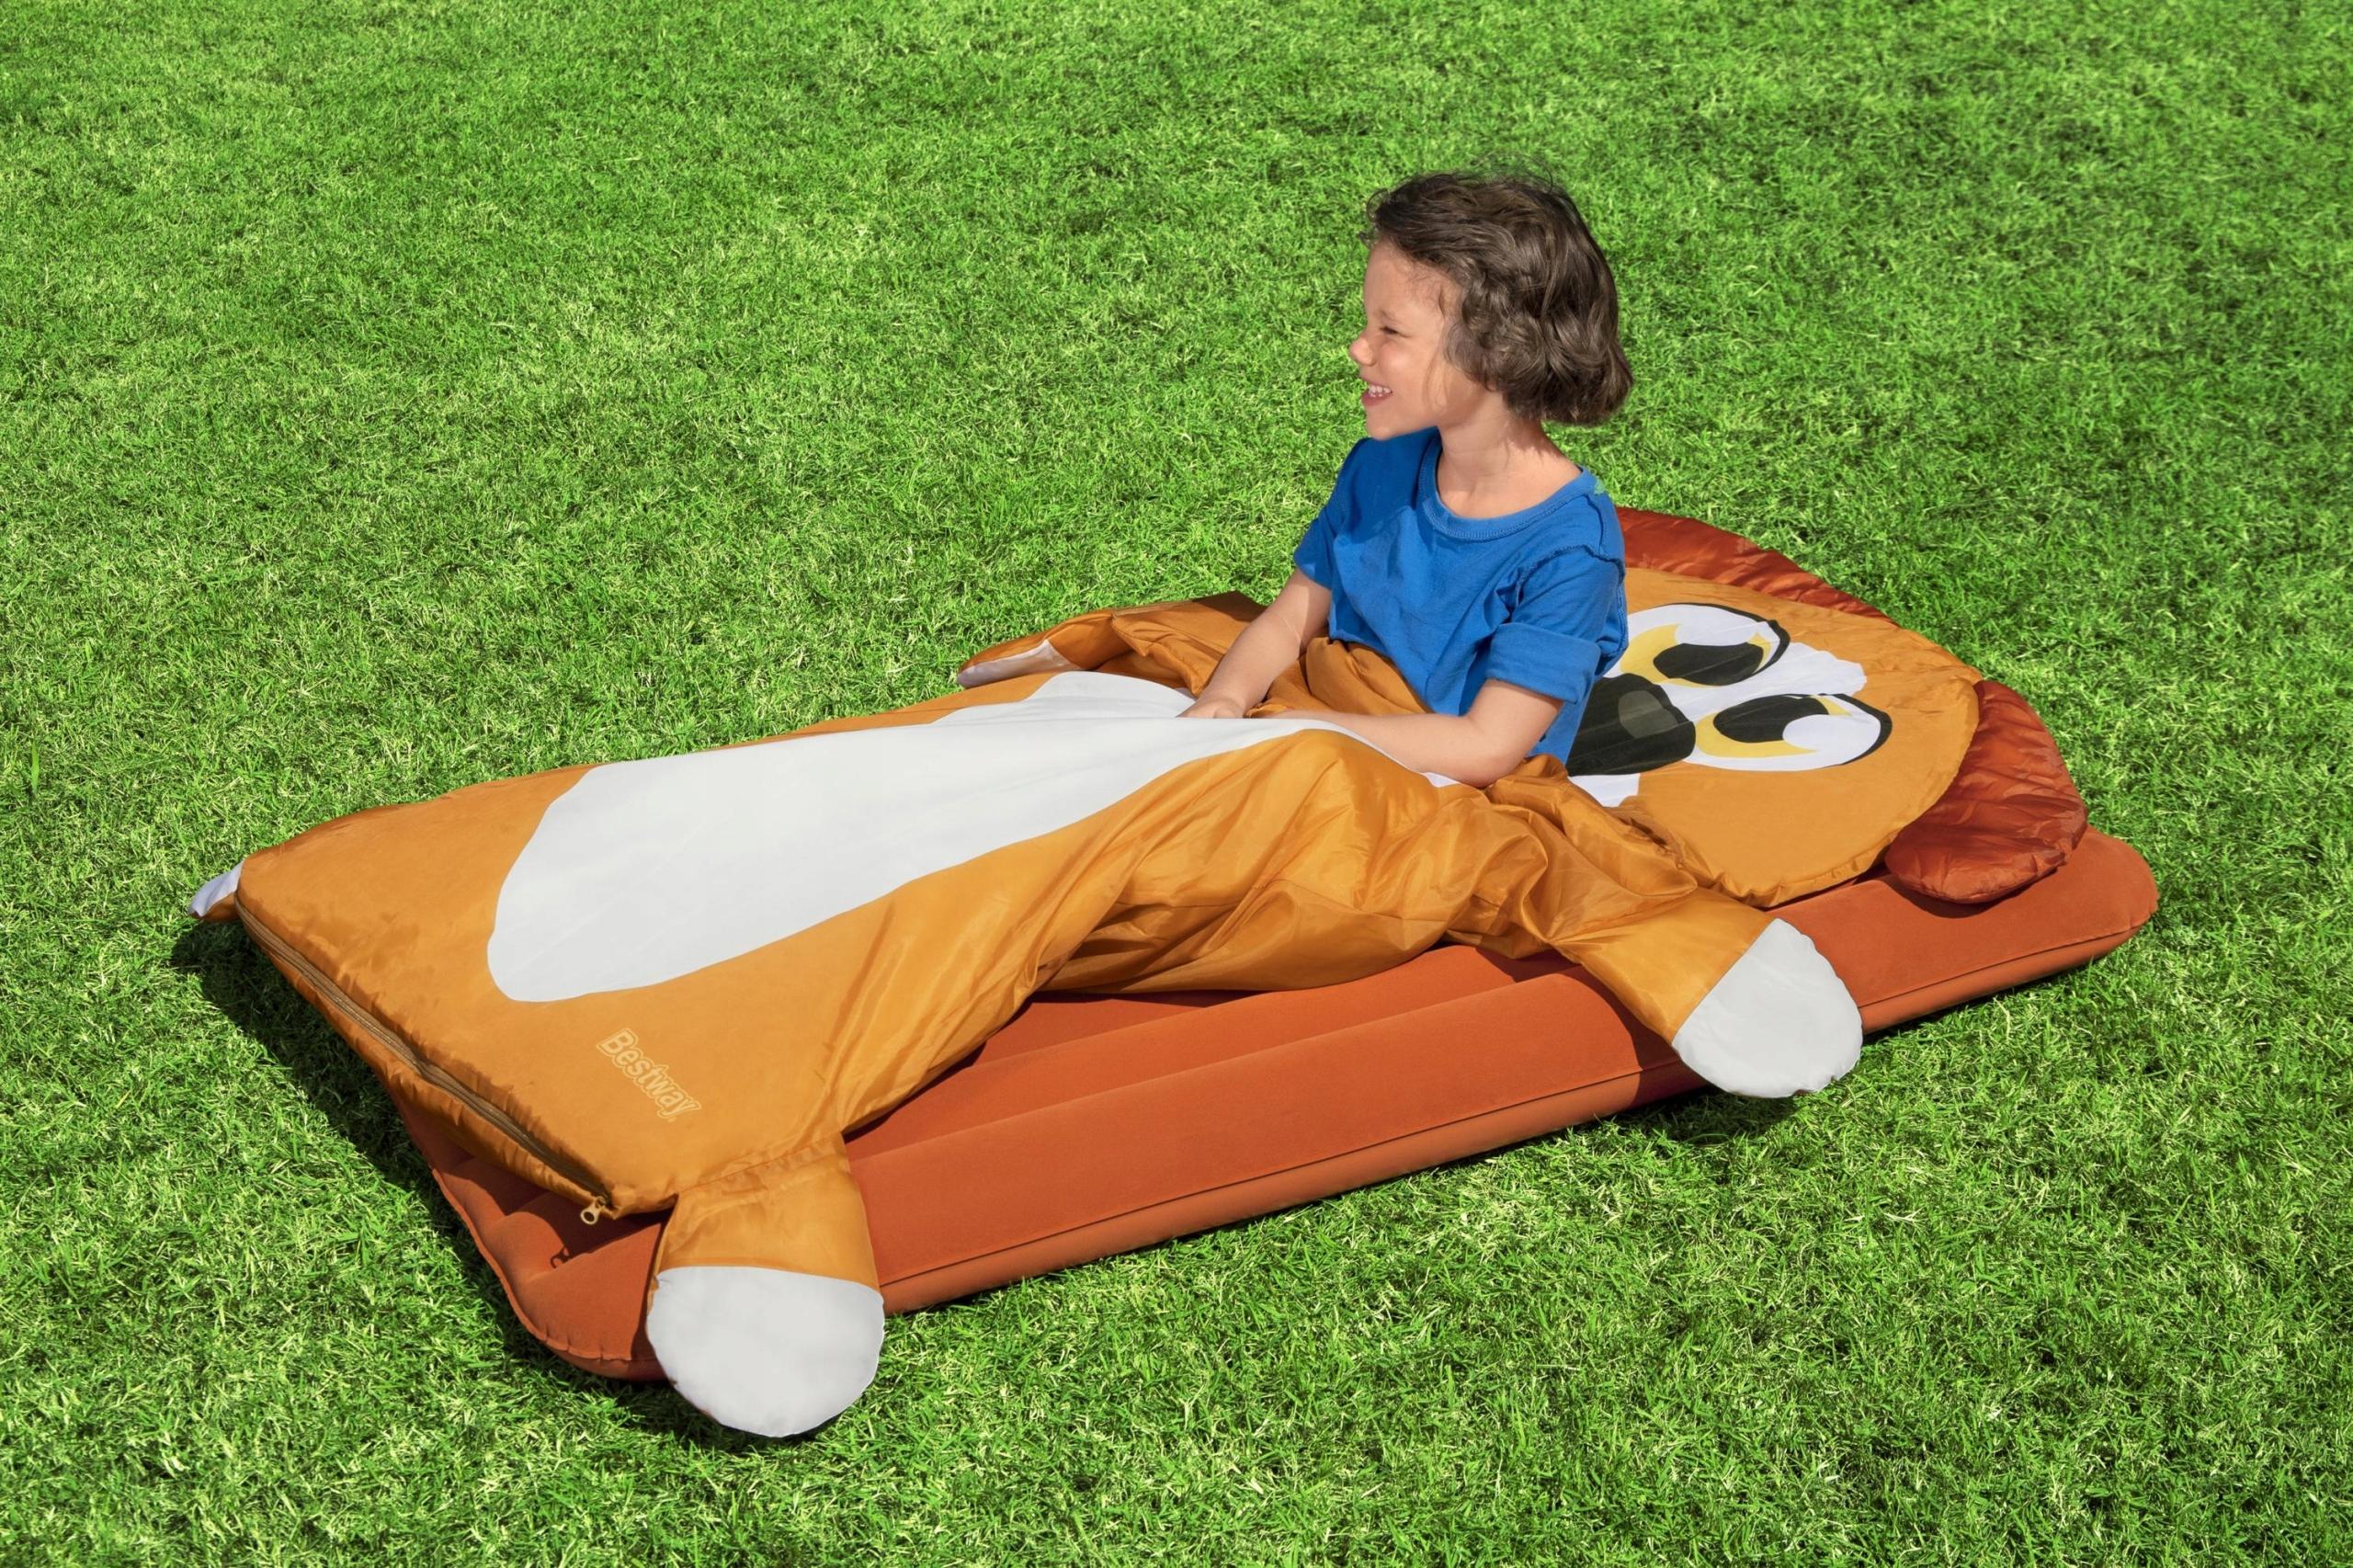 MATERAC DMUCHANY +ŚPIWÓR dla dzieci PIESEK BESTWAY Marka Inna marka